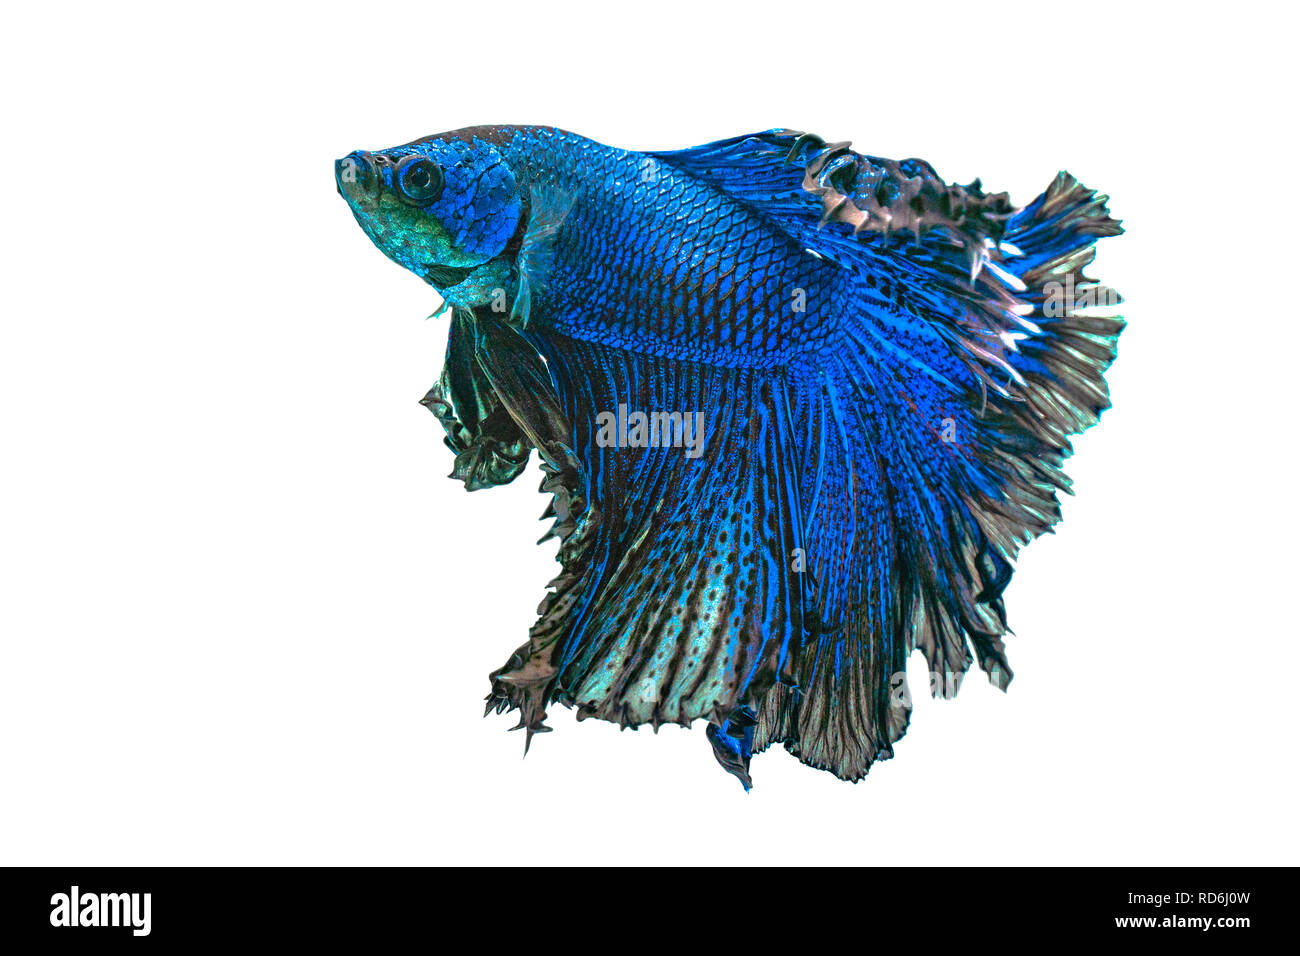 Blue siamese fighting fish,Halfmoon betta fish isolated on white background. Stock Photo